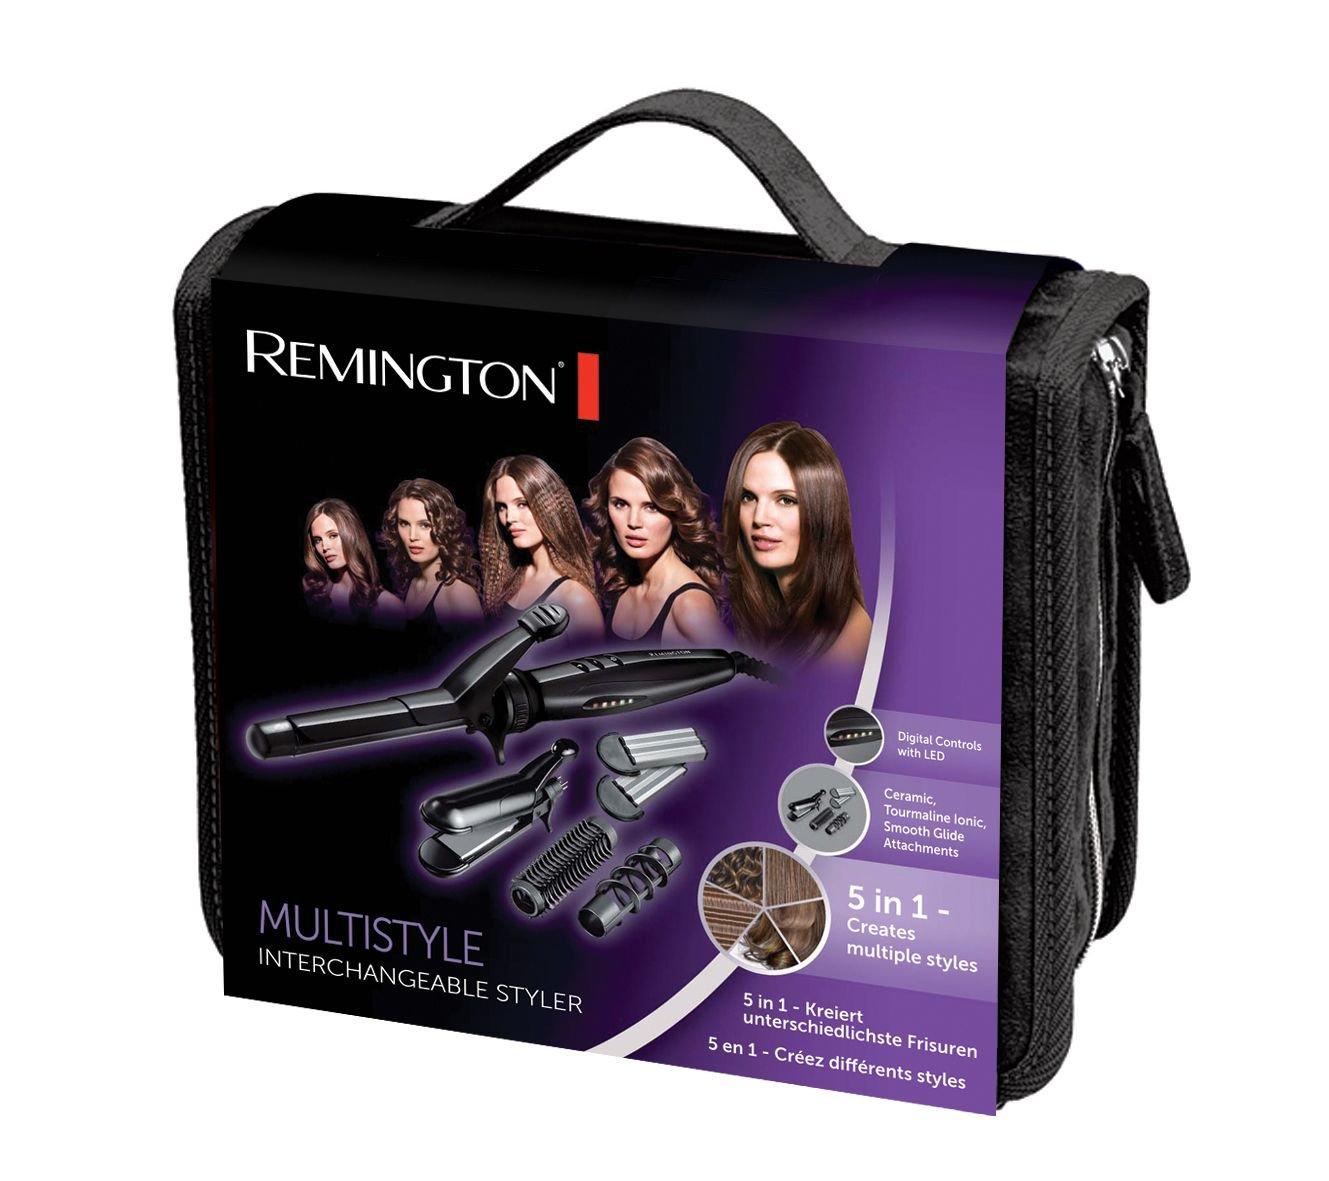 Multistayler  Remington S8670 2200030928029 - 3